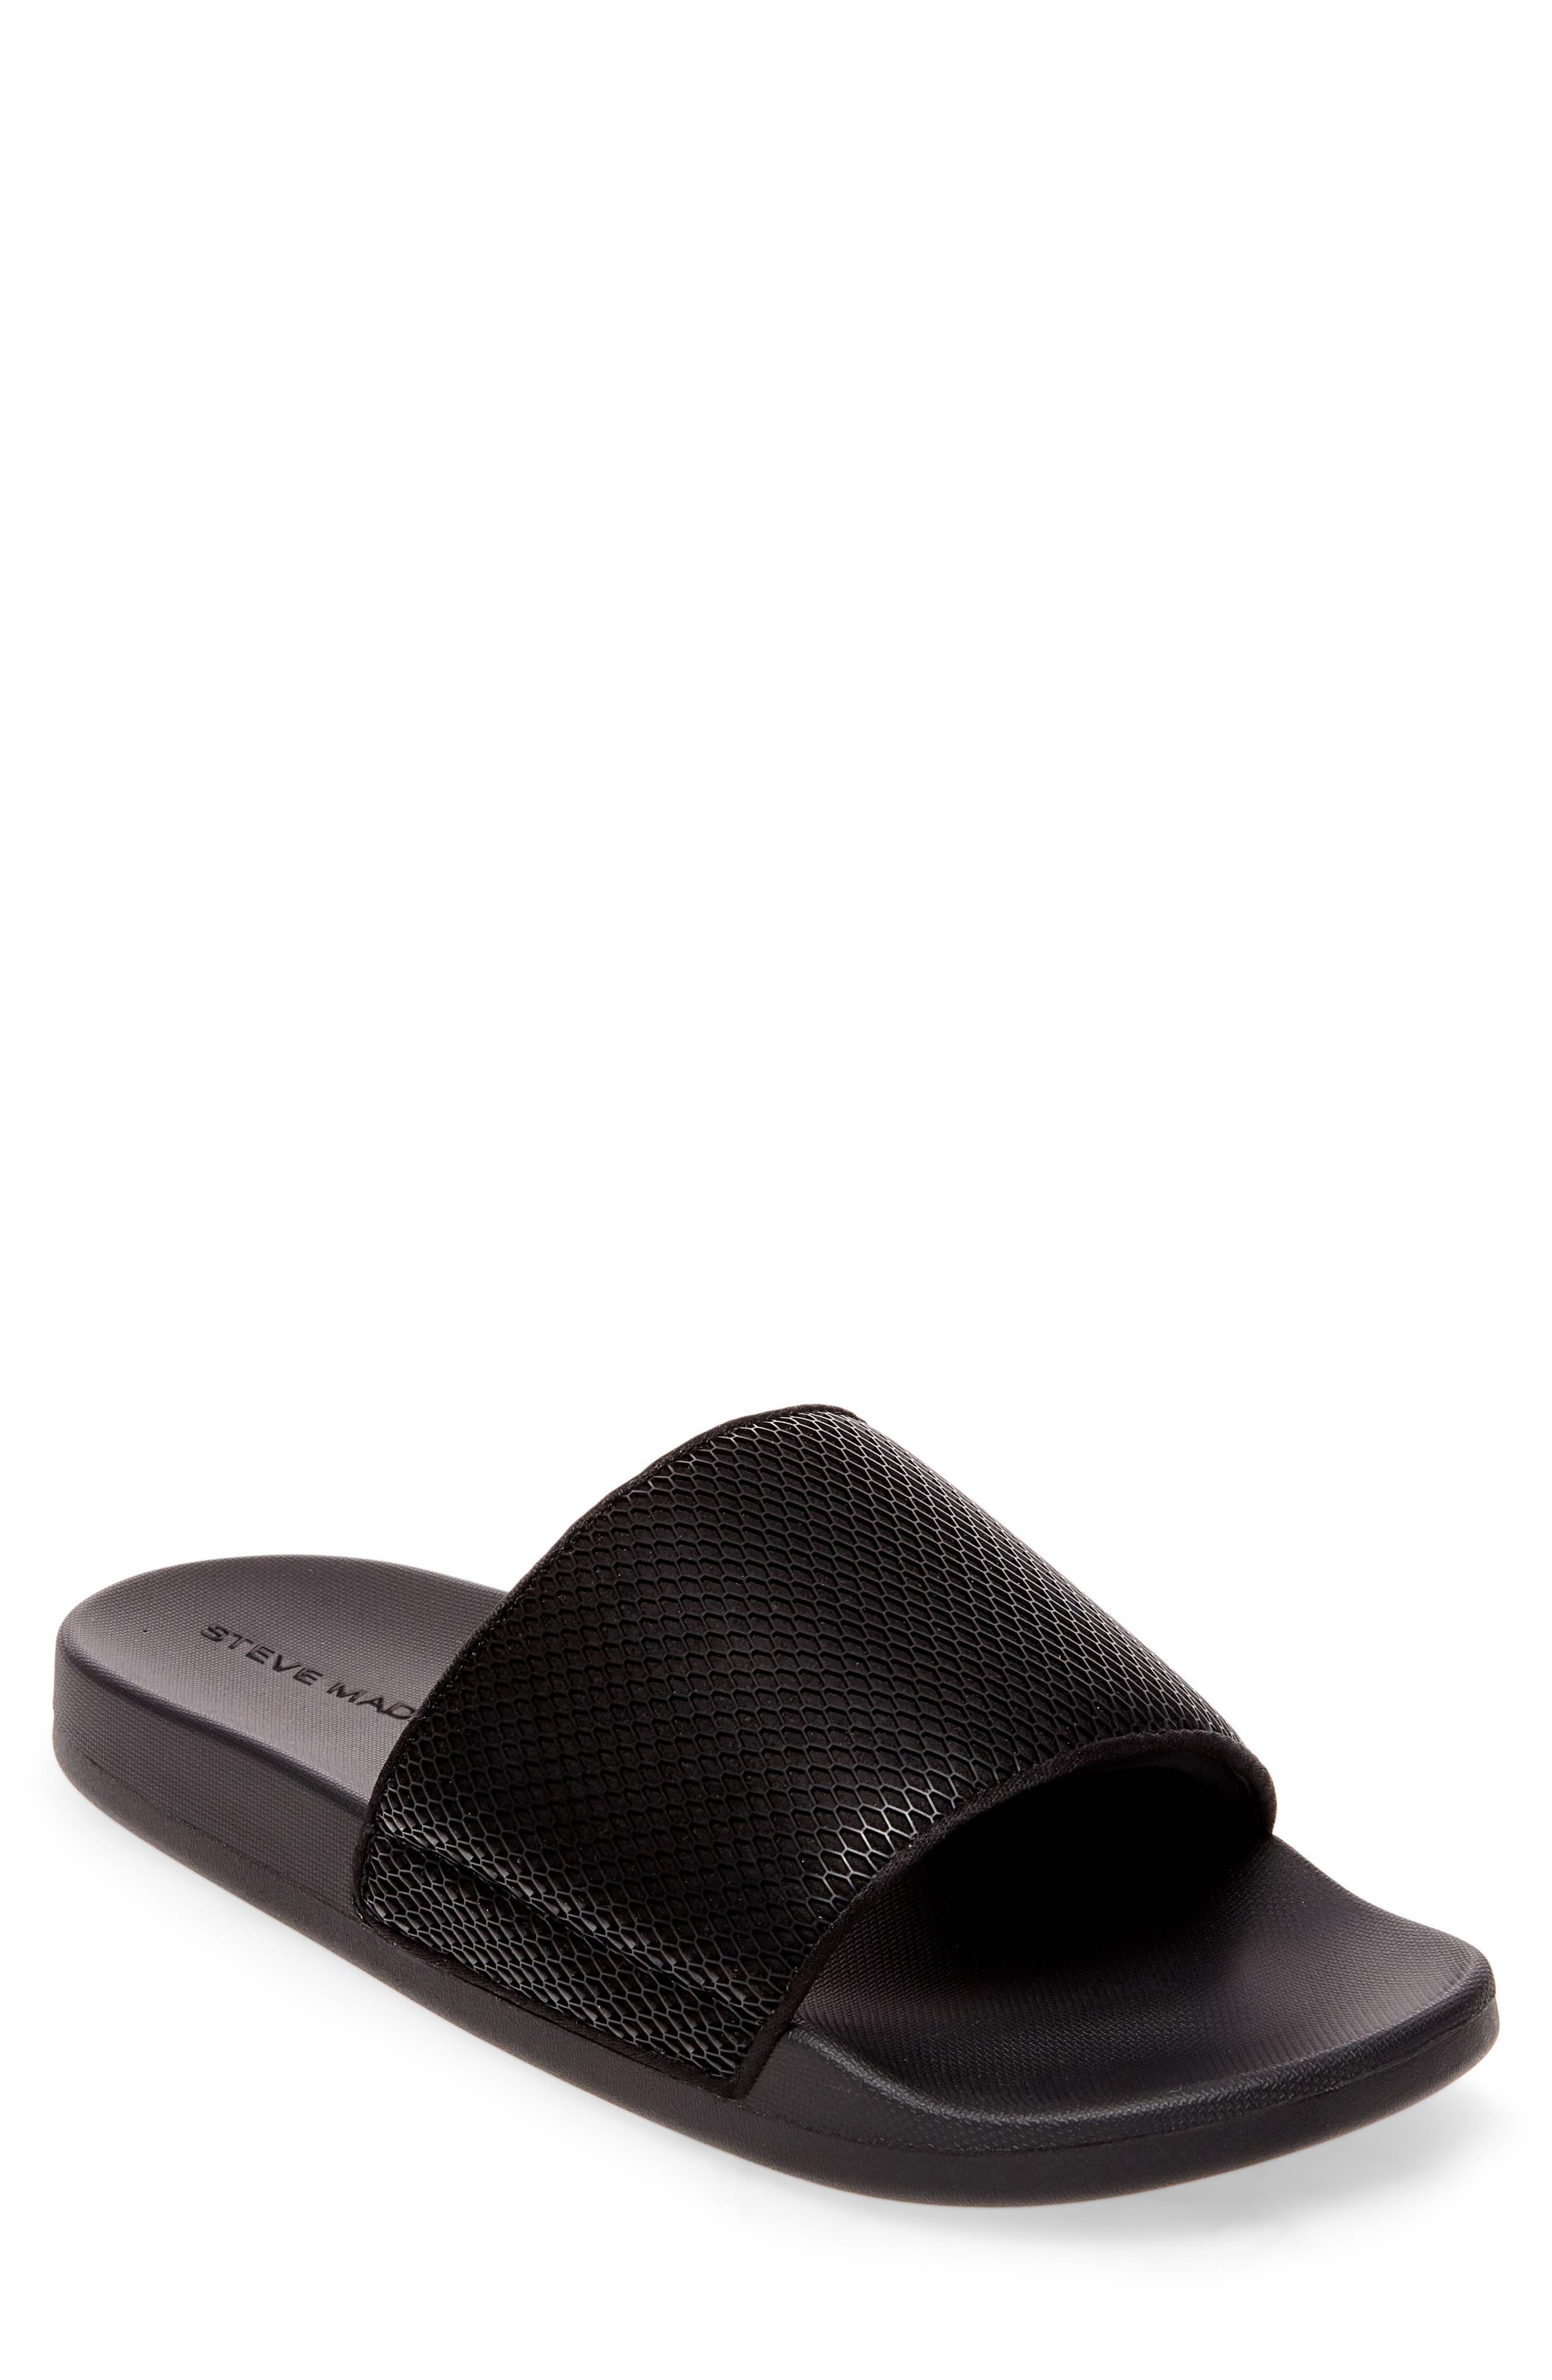 Ransom Slide Sandal,                             Main thumbnail 1, color,                             Black